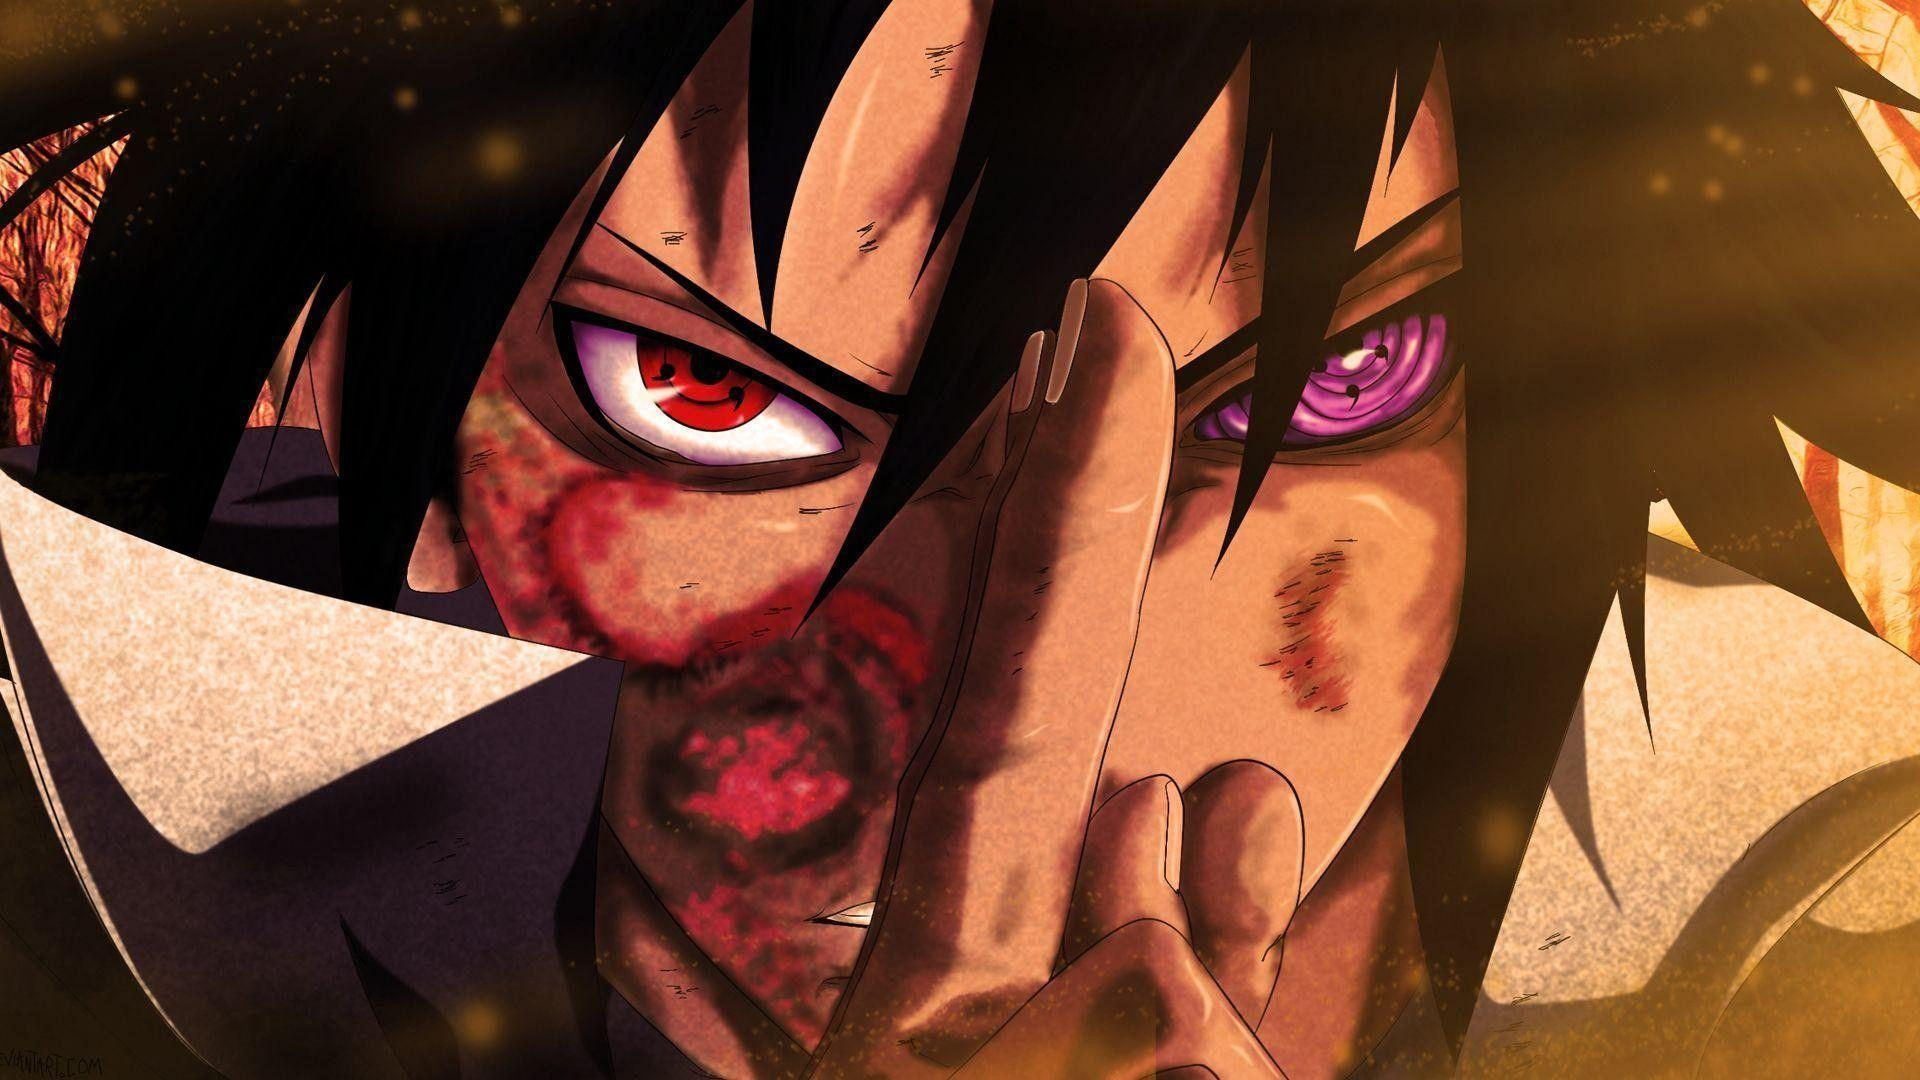 Aesthetic Naruto And Sasuke Wallpapers Wallpaper Cave